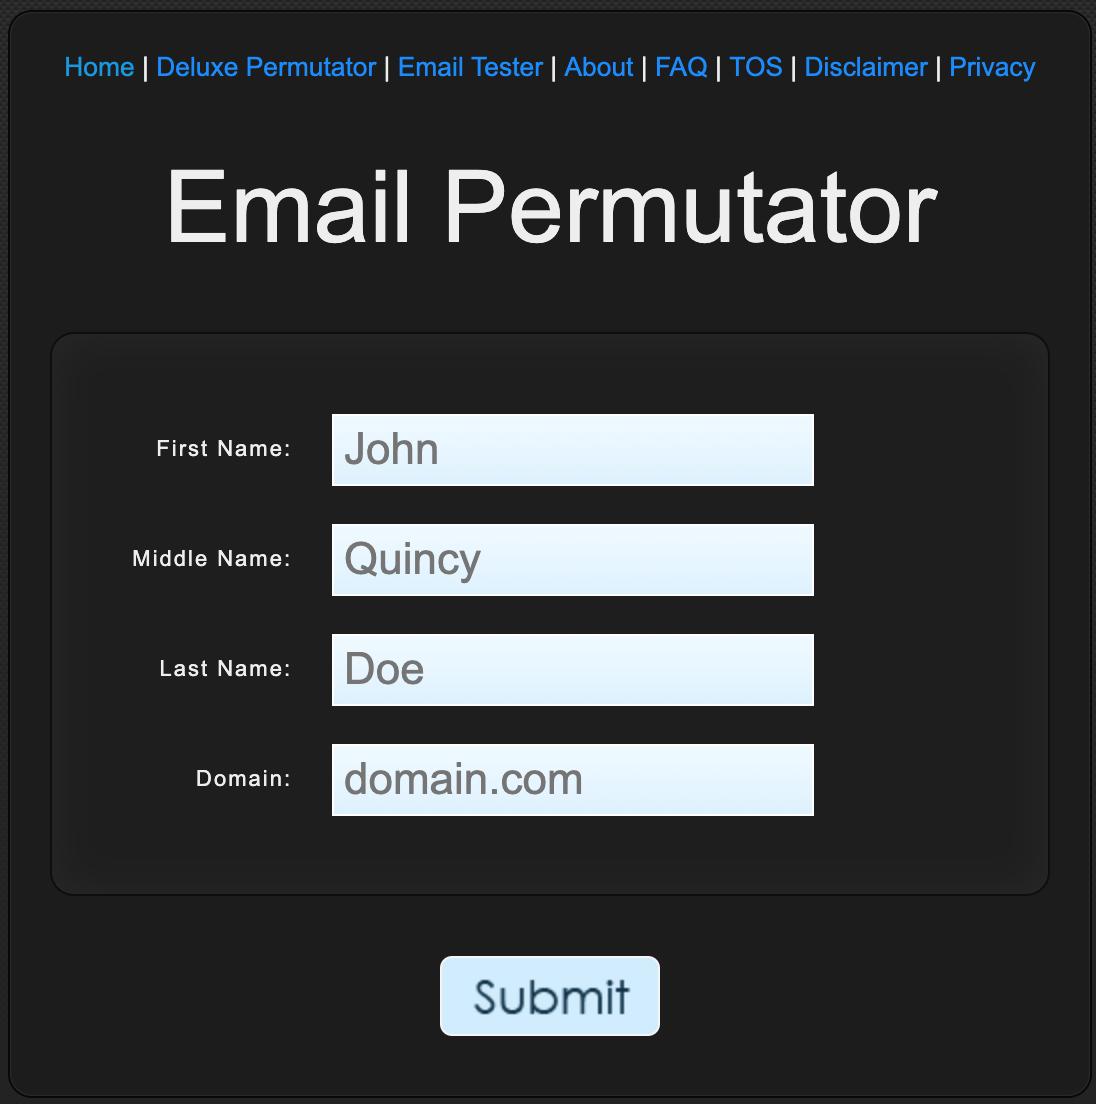 Screenshot of Email Permutator search form